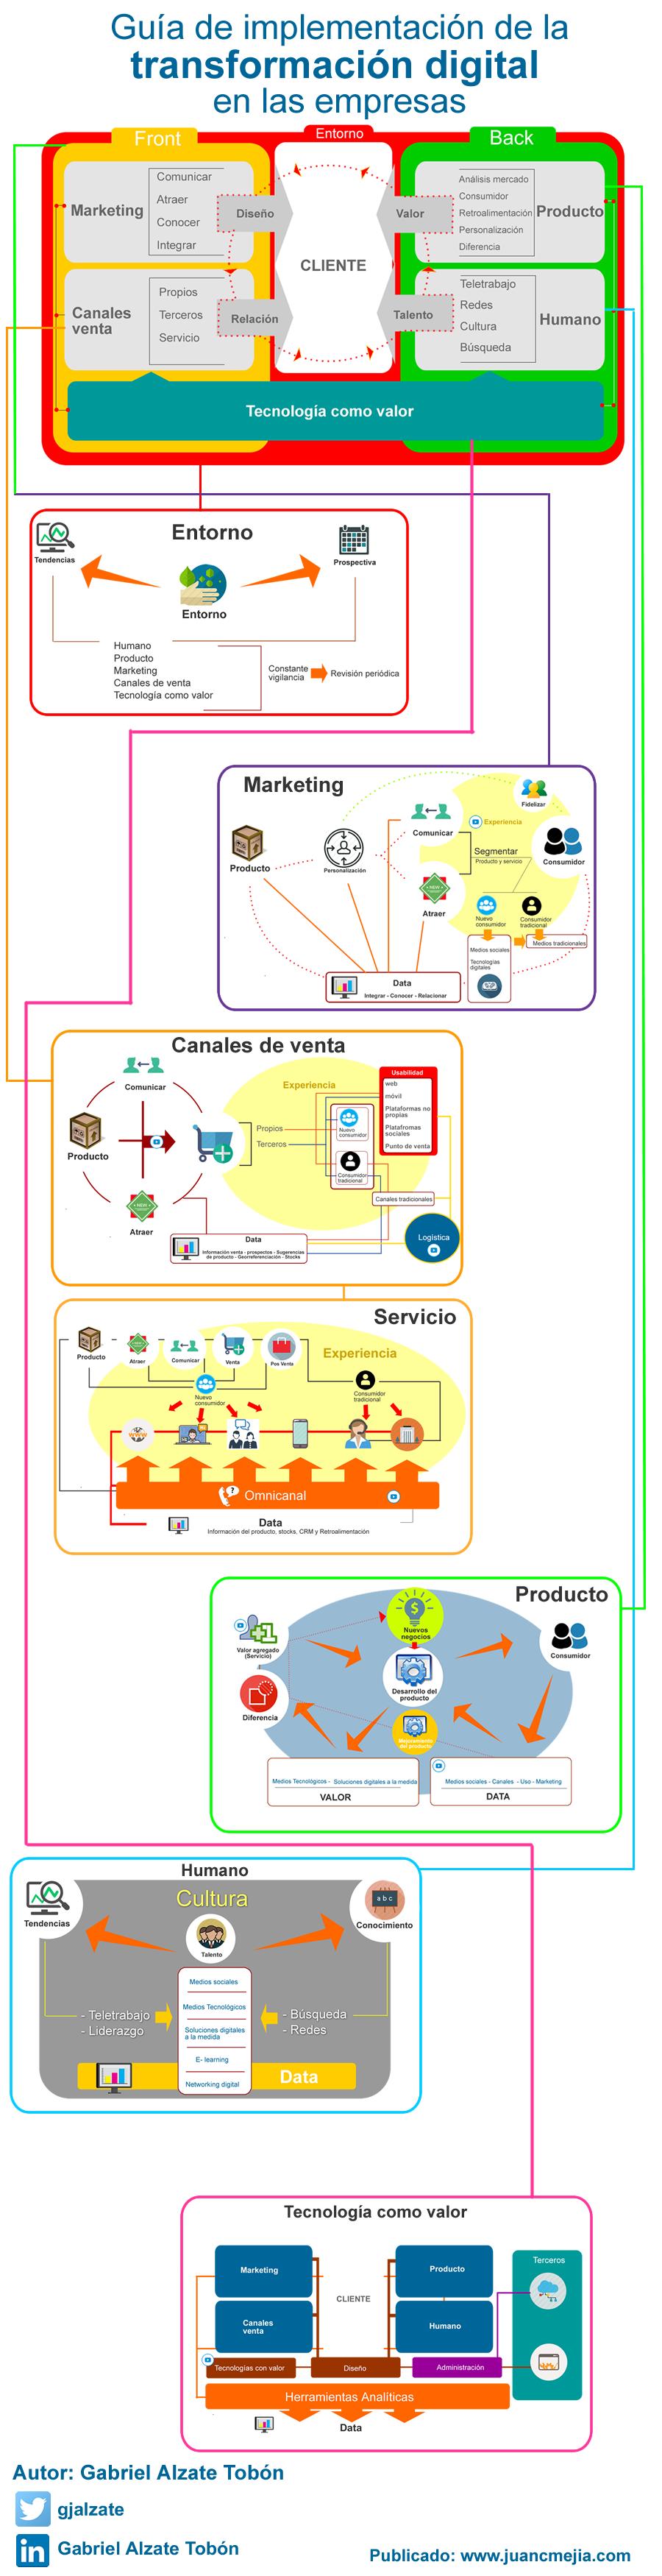 Modelo de transformación digital Infografía en español